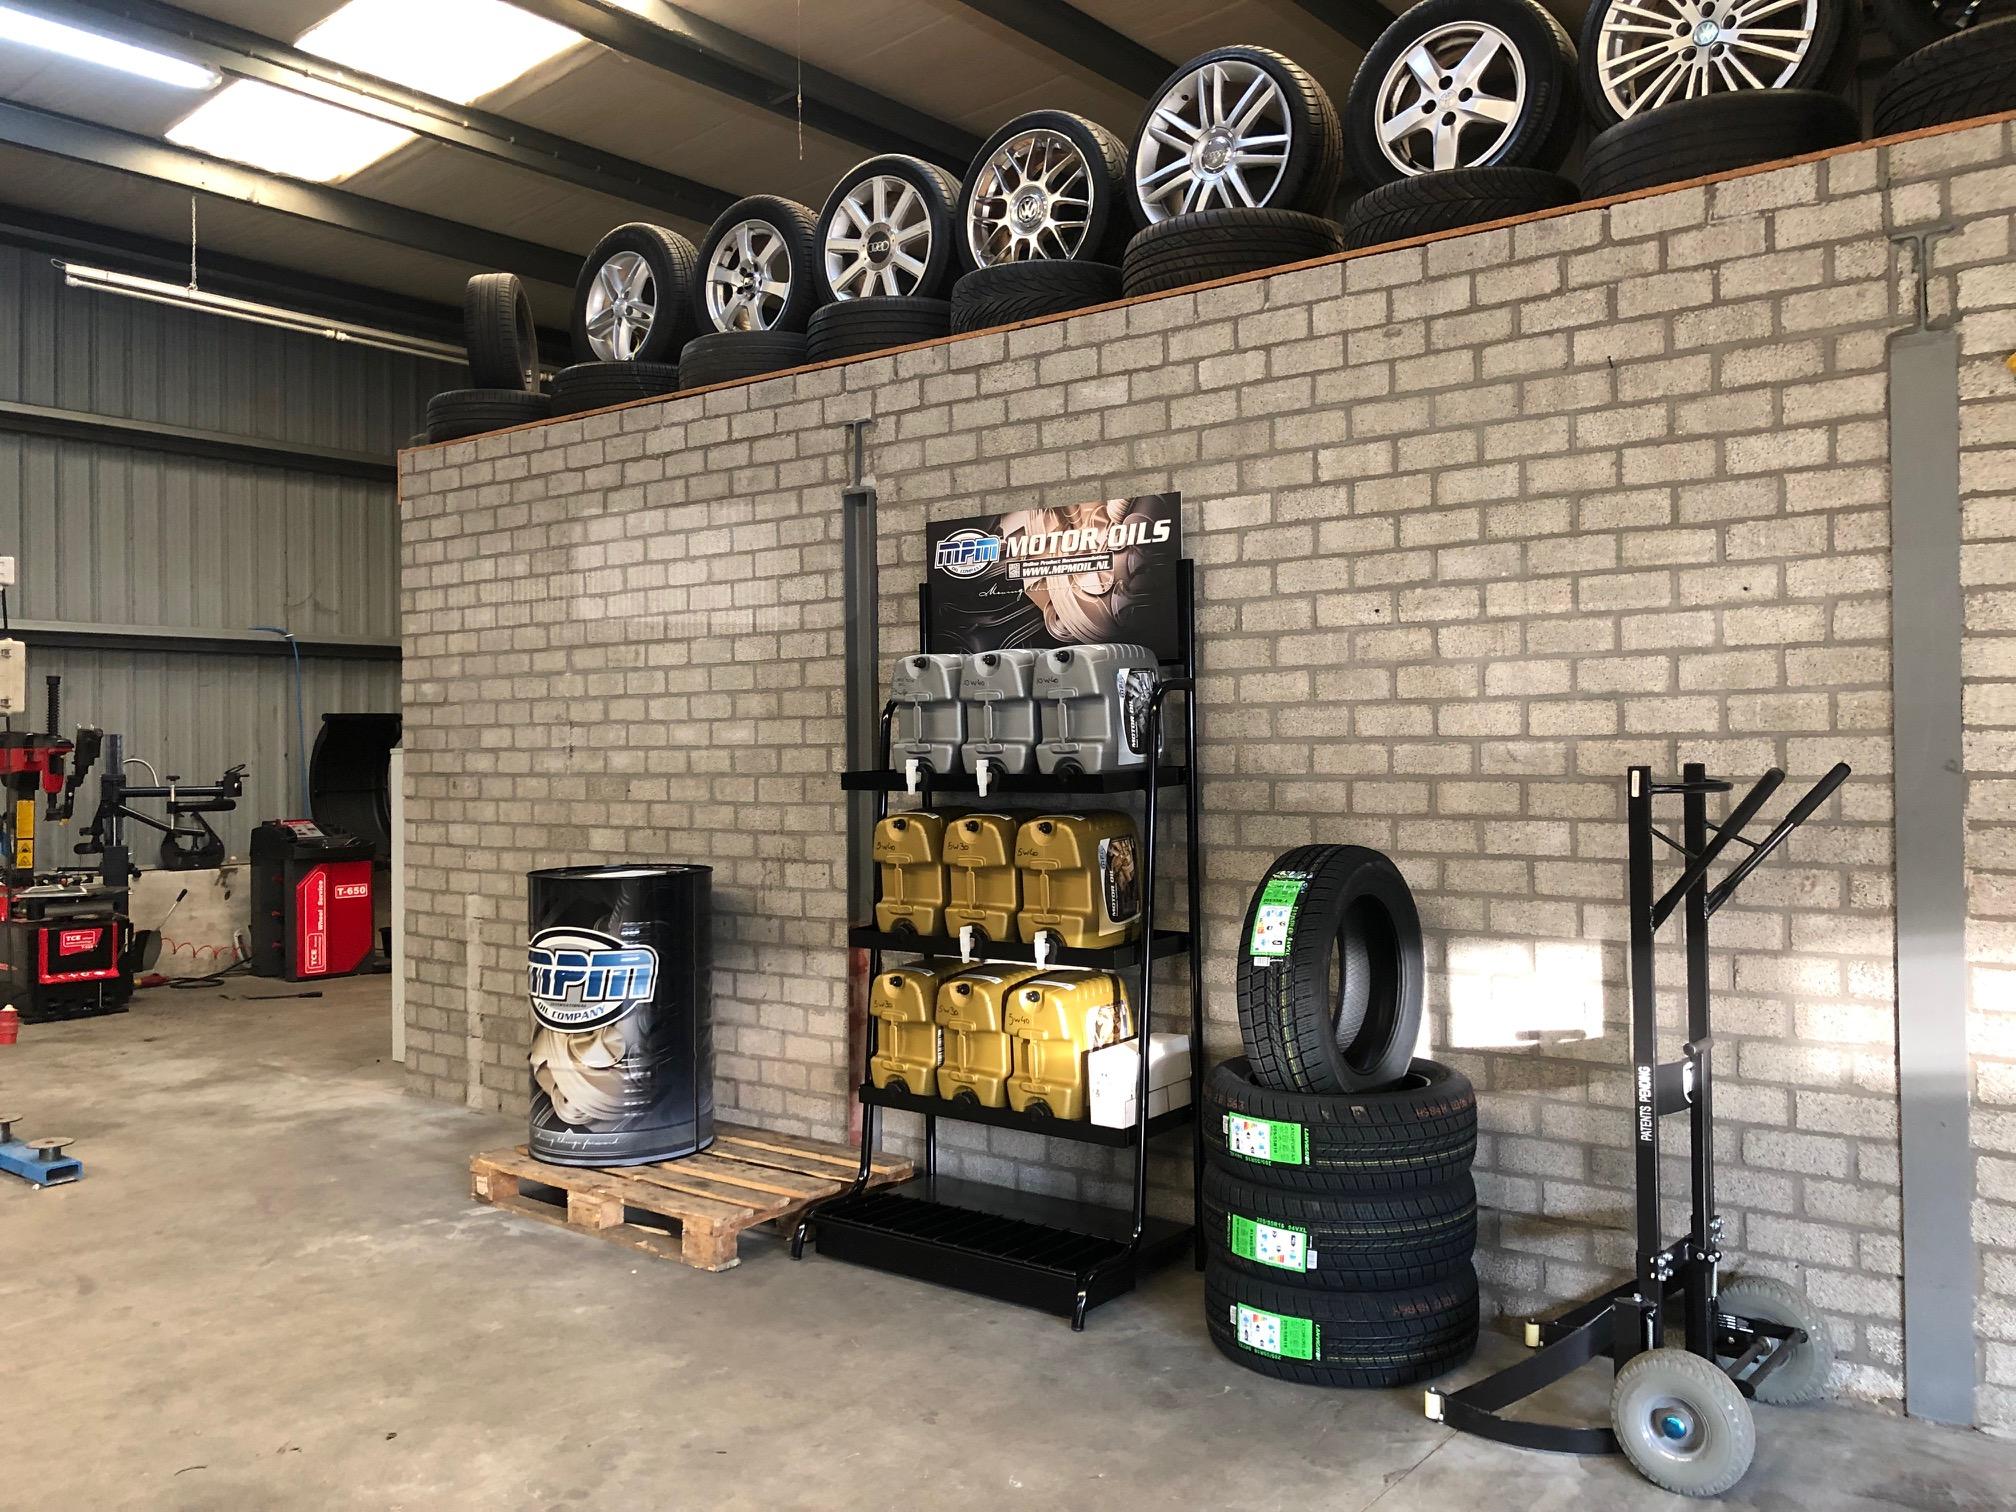 Werkplaats KZ Cars